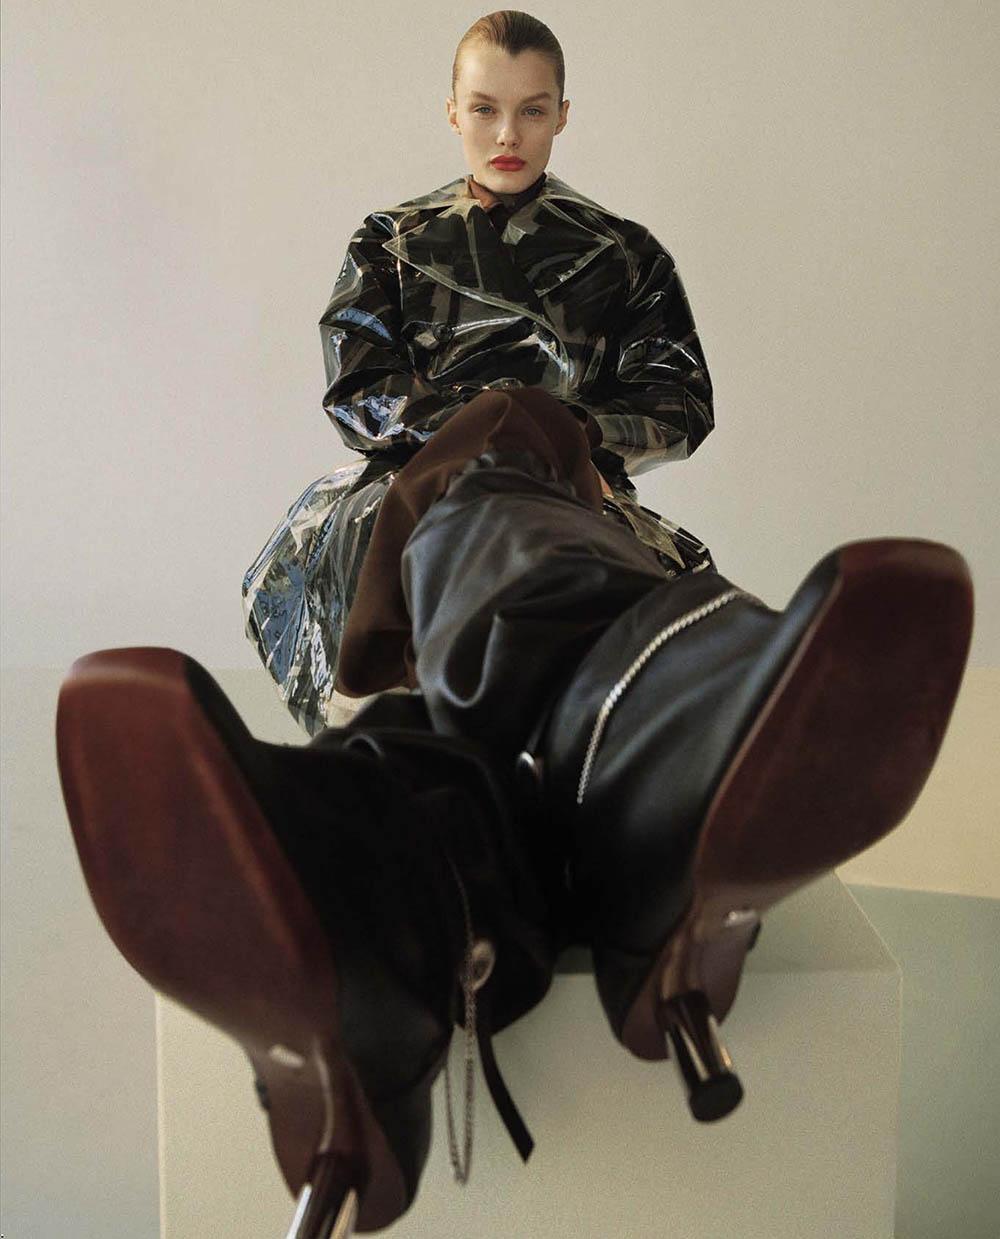 Kris Grikaite by Brianna Capozzi for Vogue Italia April 2019